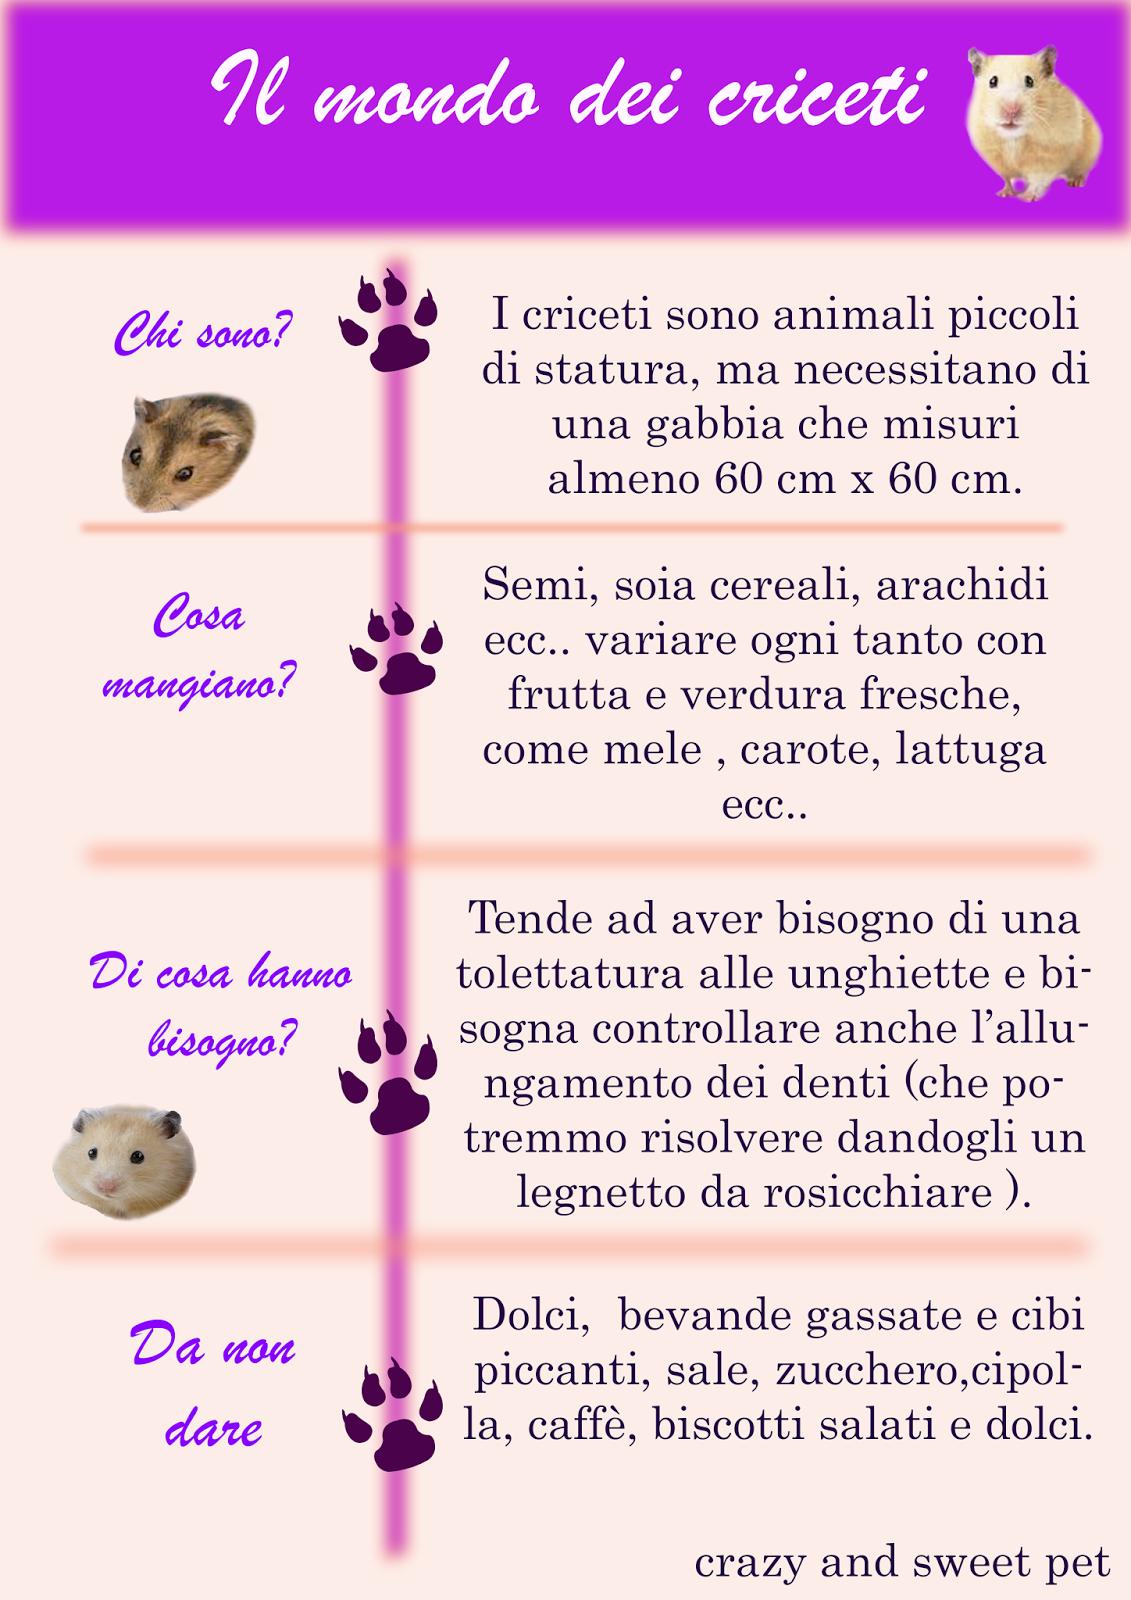 infografica-animali-criceti